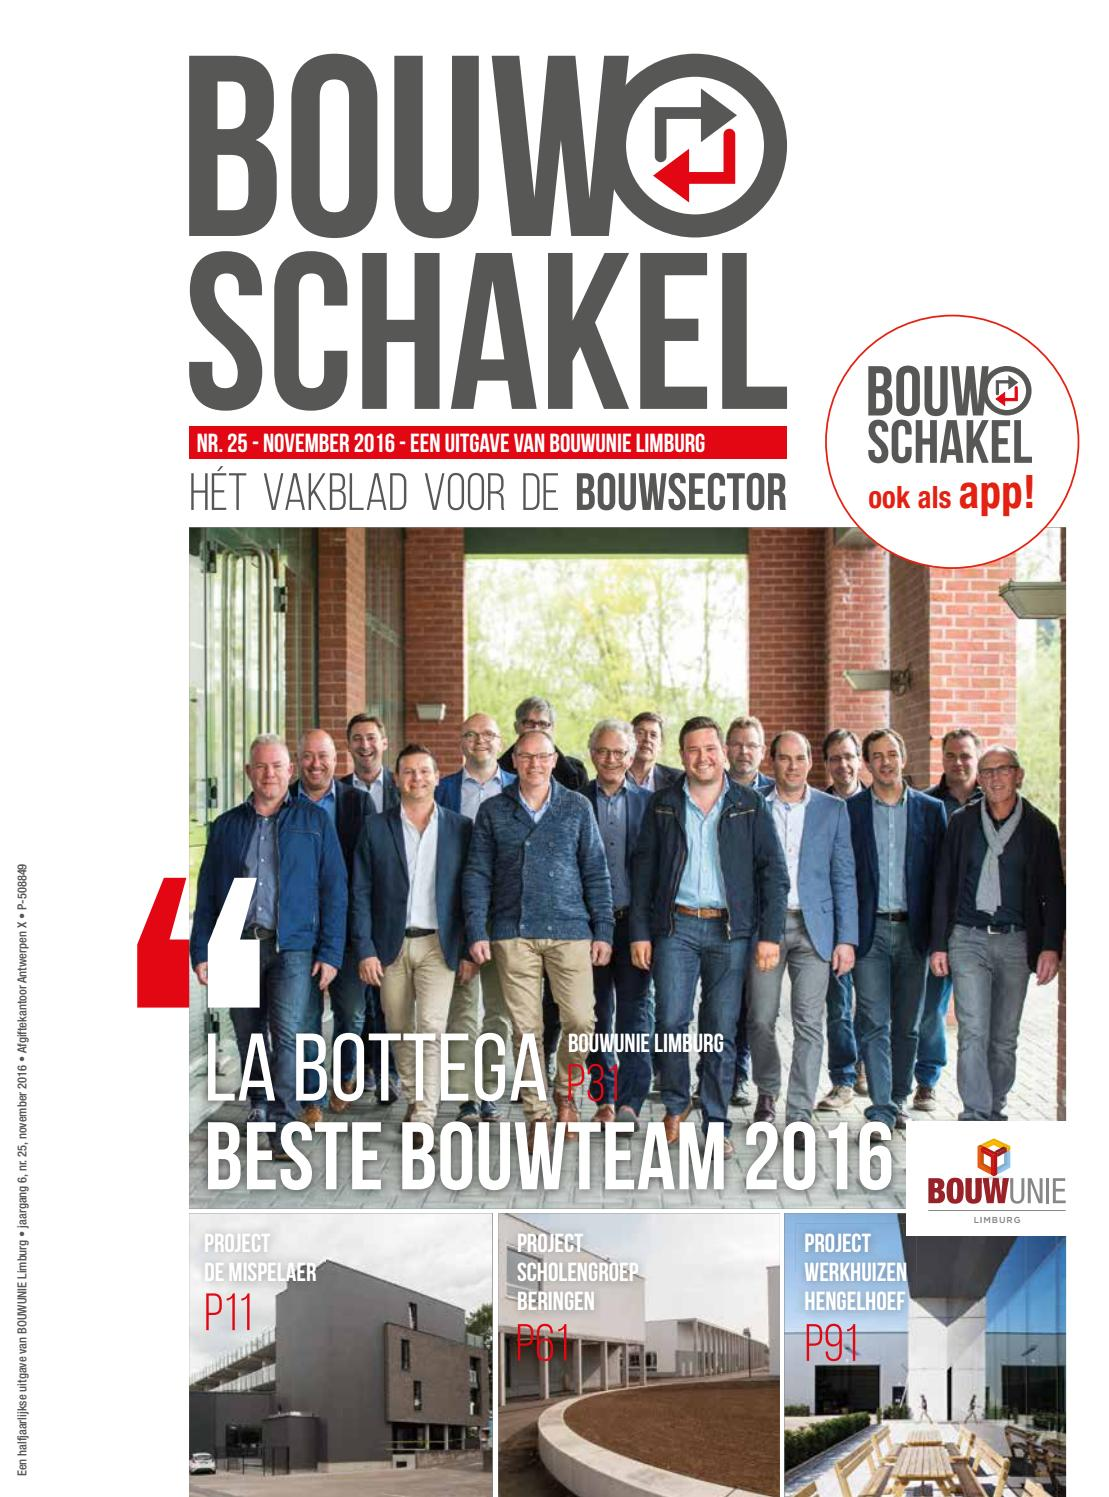 Bouwschakel november 2016 by Davy Maesen issuu